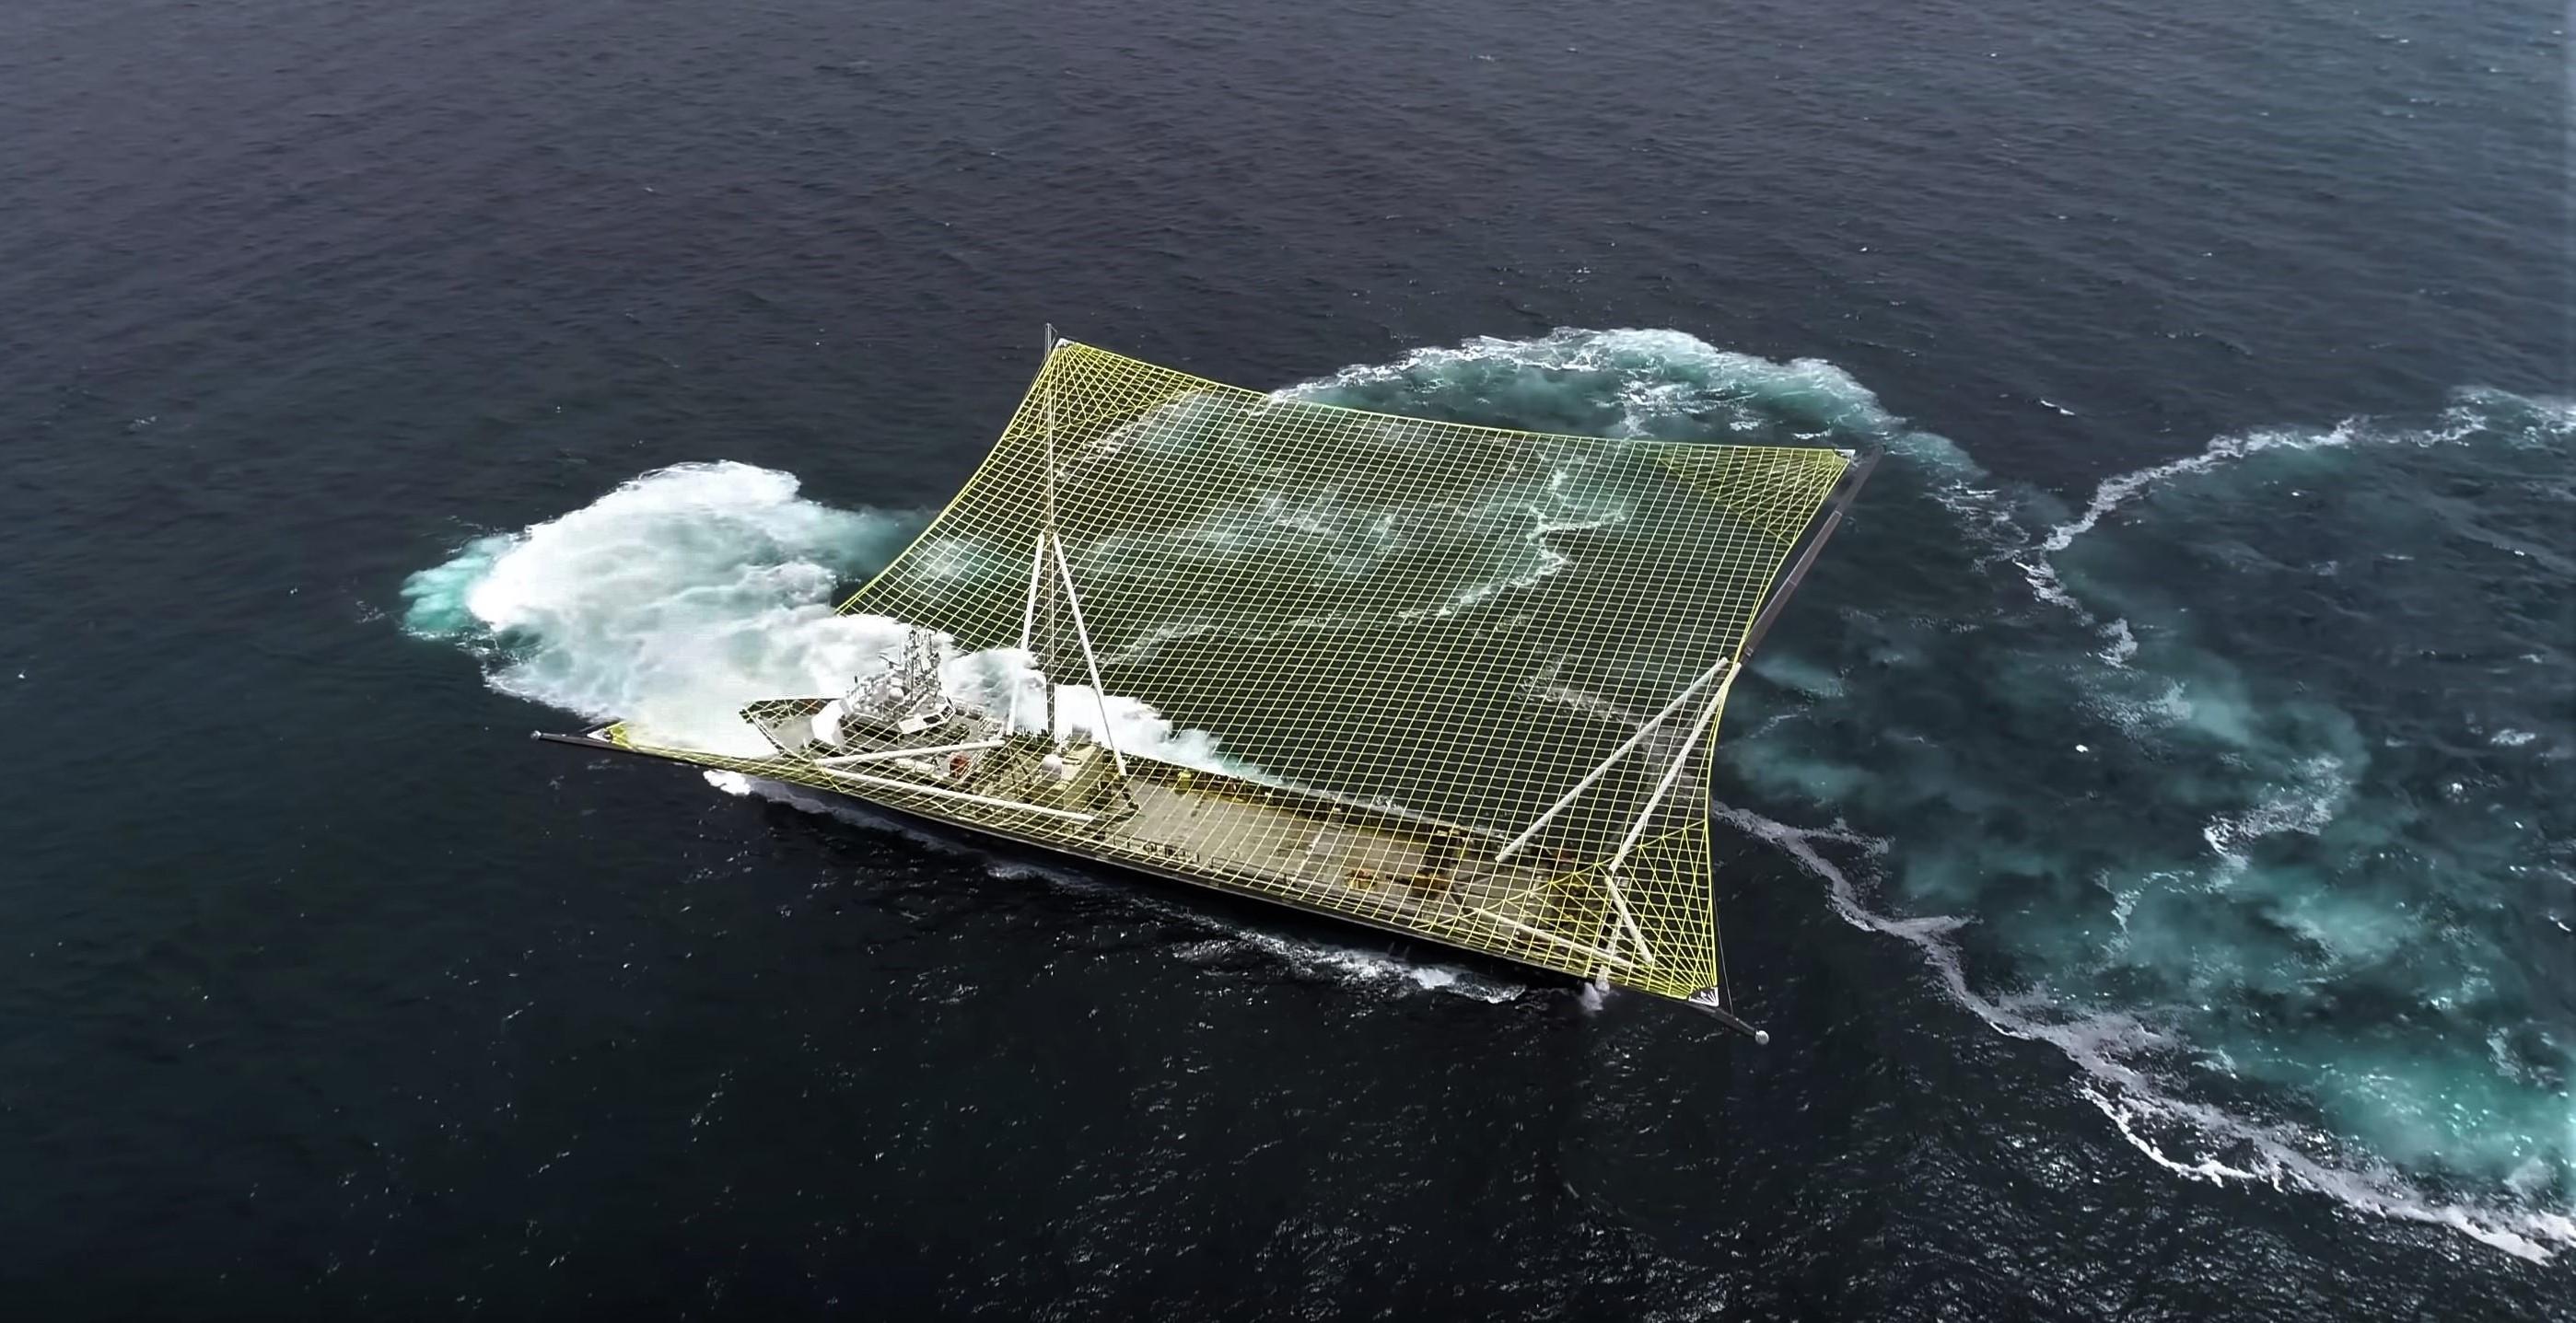 Mr Steven new net sea trials July 2018 4